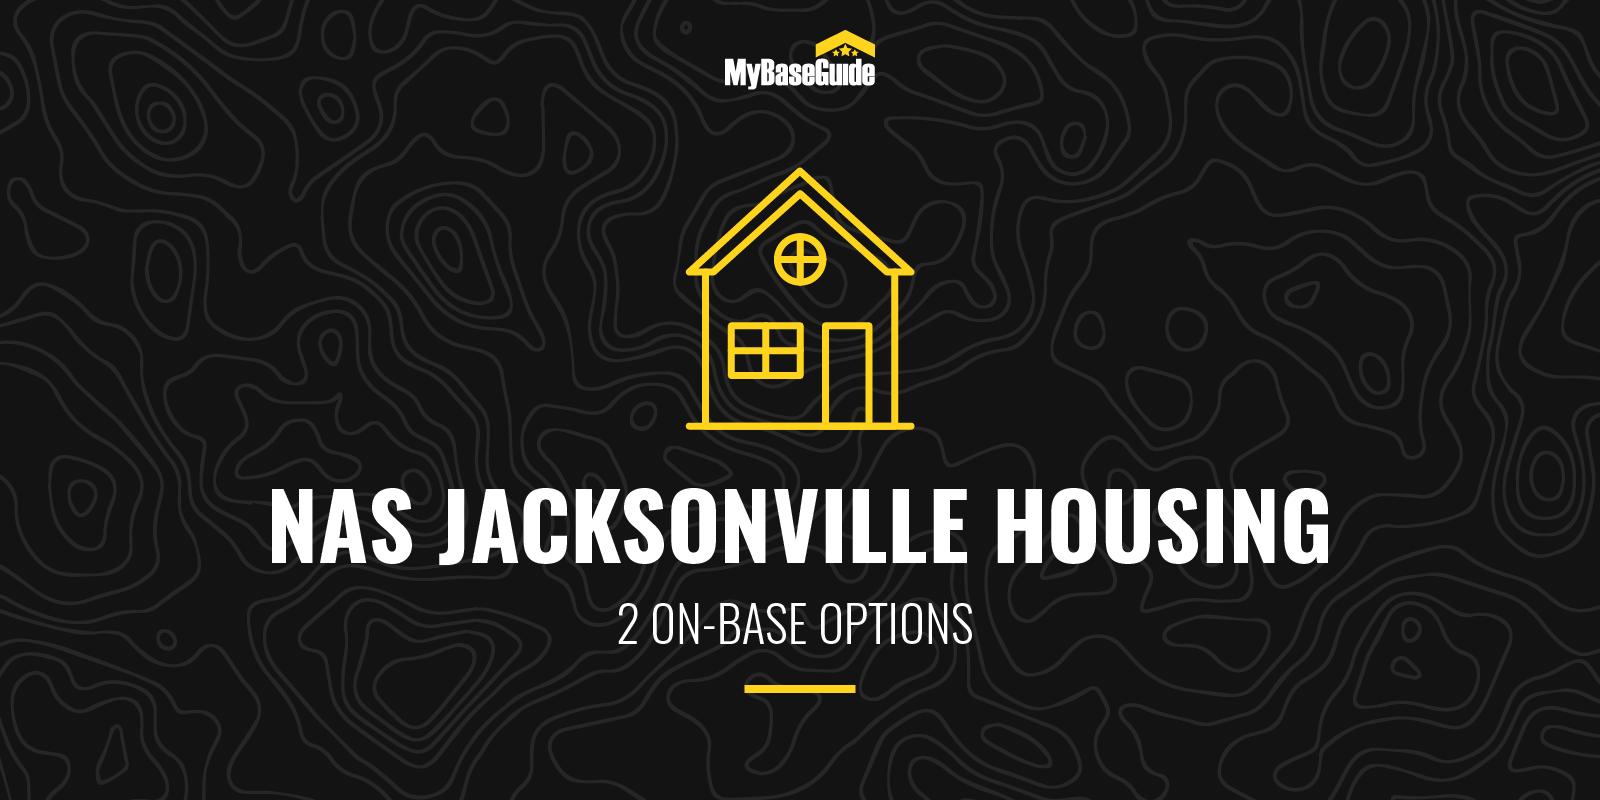 NAS Jacksonville Housing: 2 On-Base Options